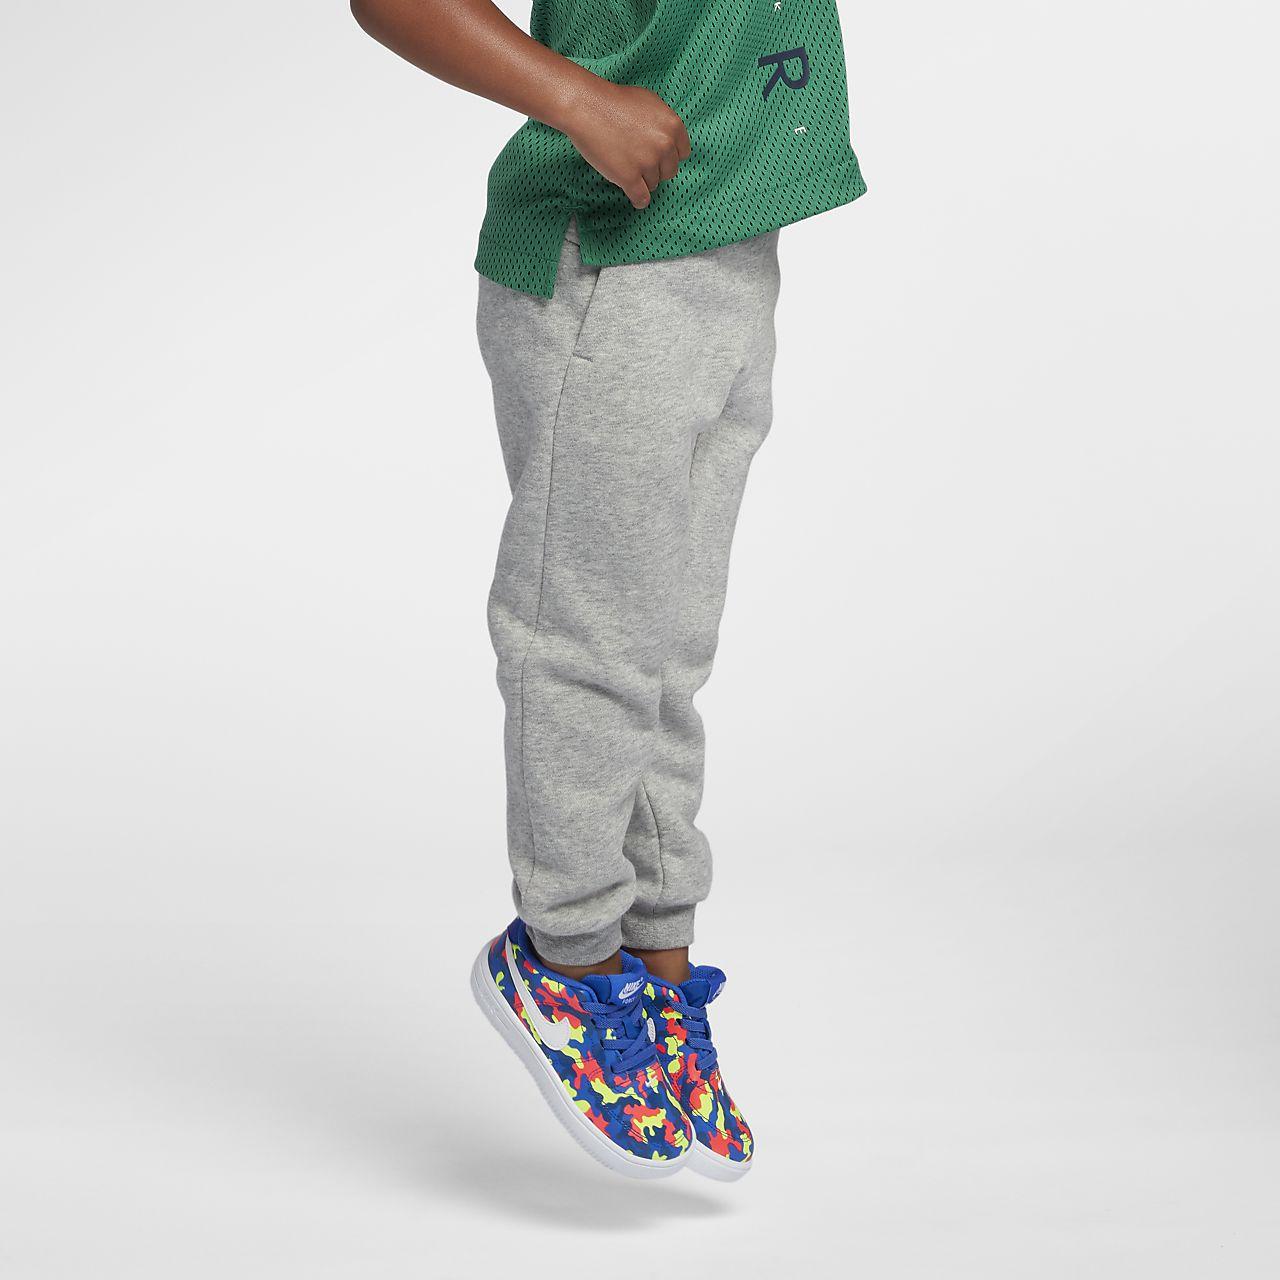 Pour Enfant Pantalon Nike Air Petit LUMqzSVpG